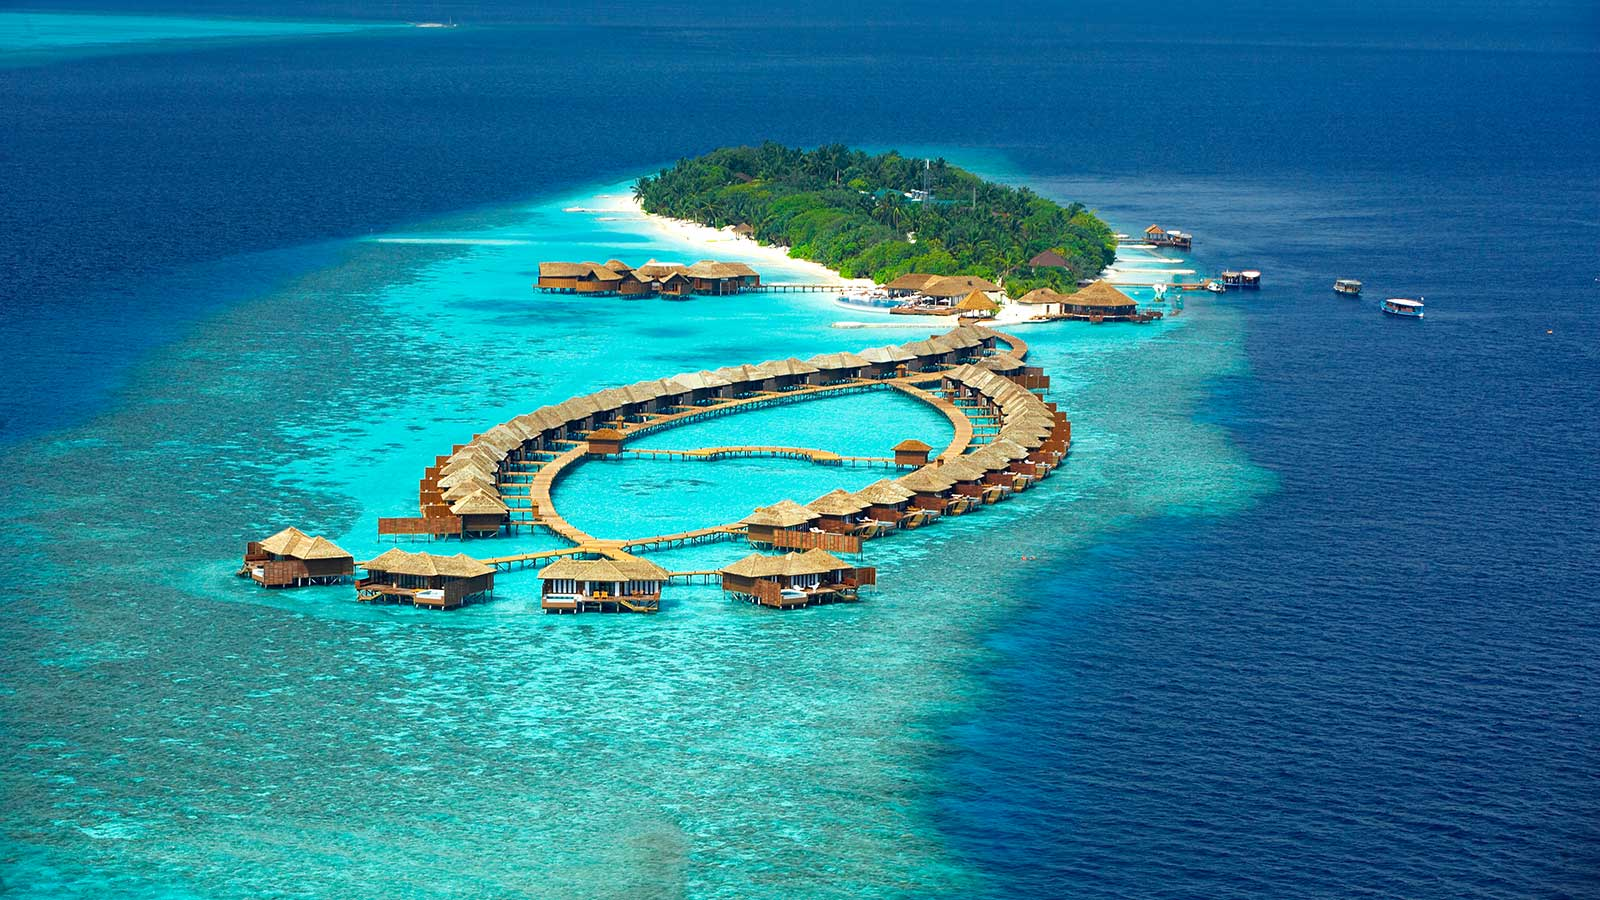 Lily Beach Resort Maldives